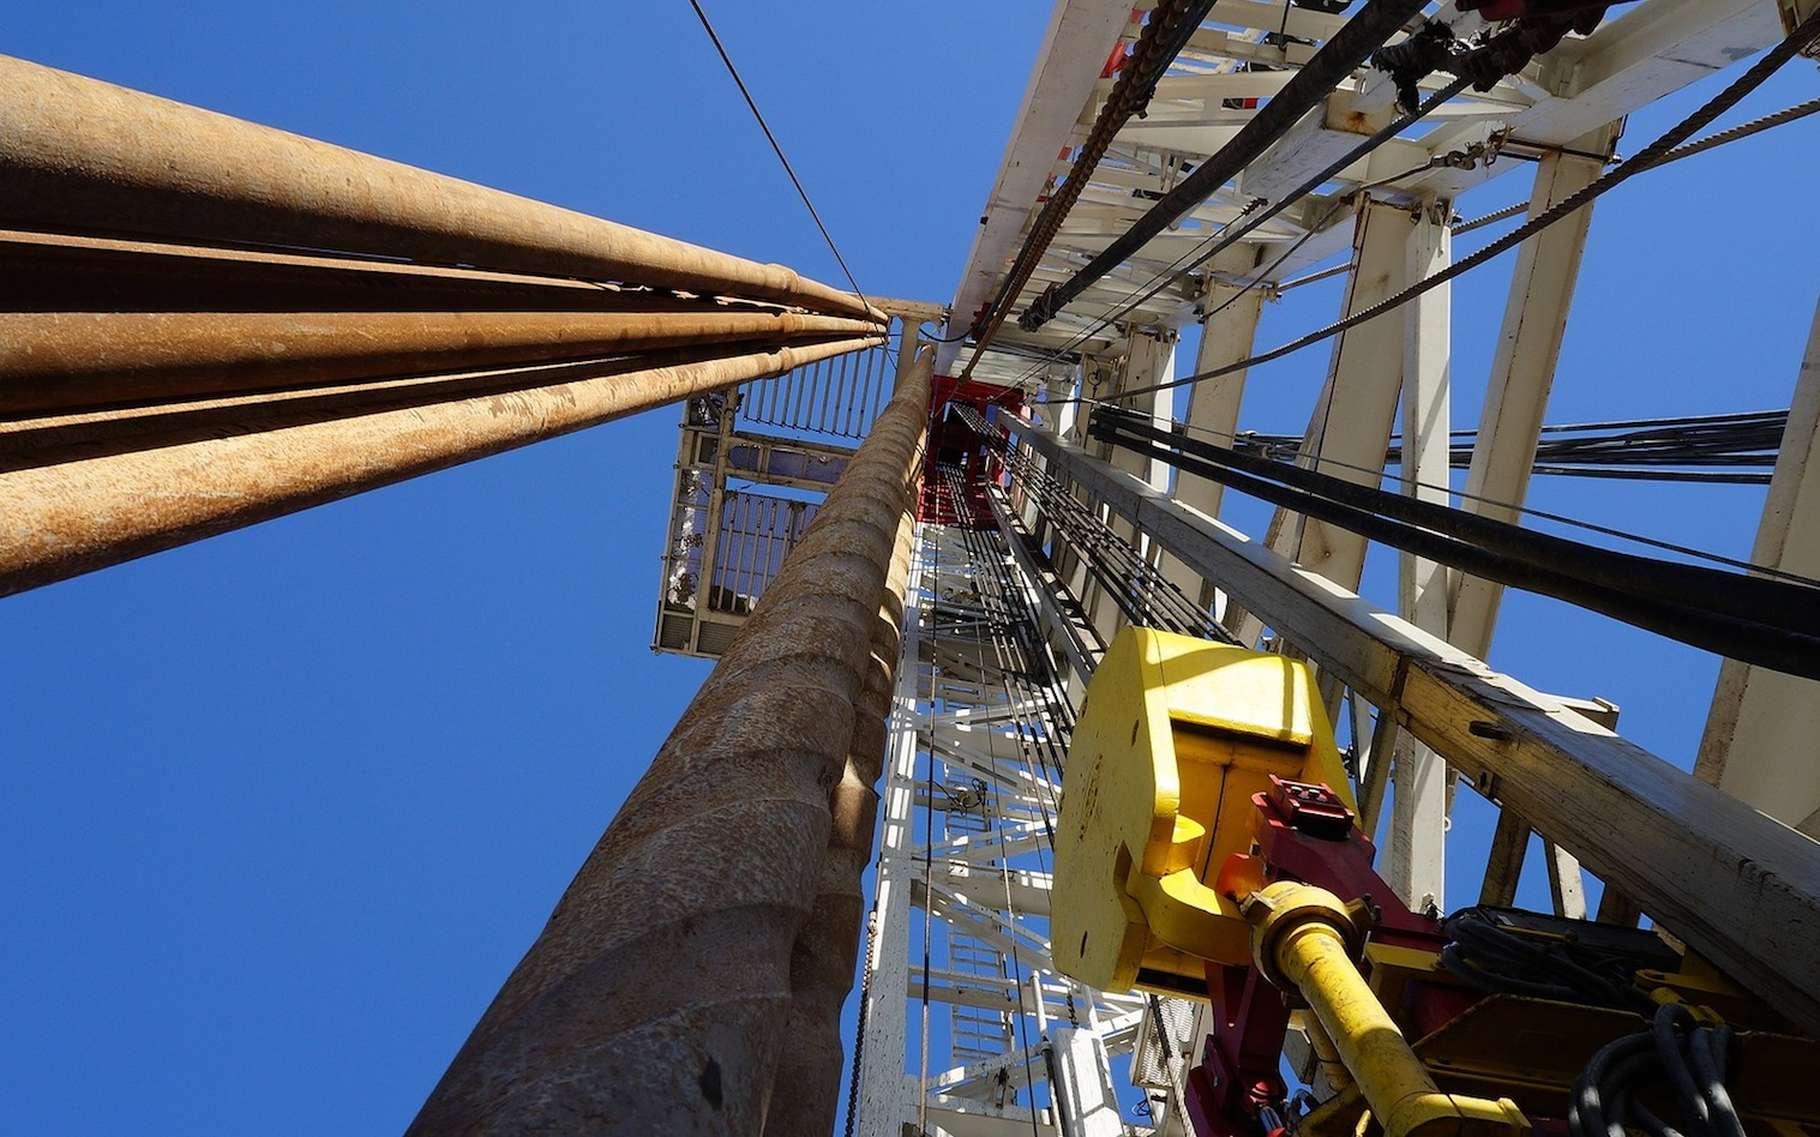 Installation sur un site de forage d'hydrocarbures conventionnels. © anita-starzycka, Pixabay, CC0 Creative Commons